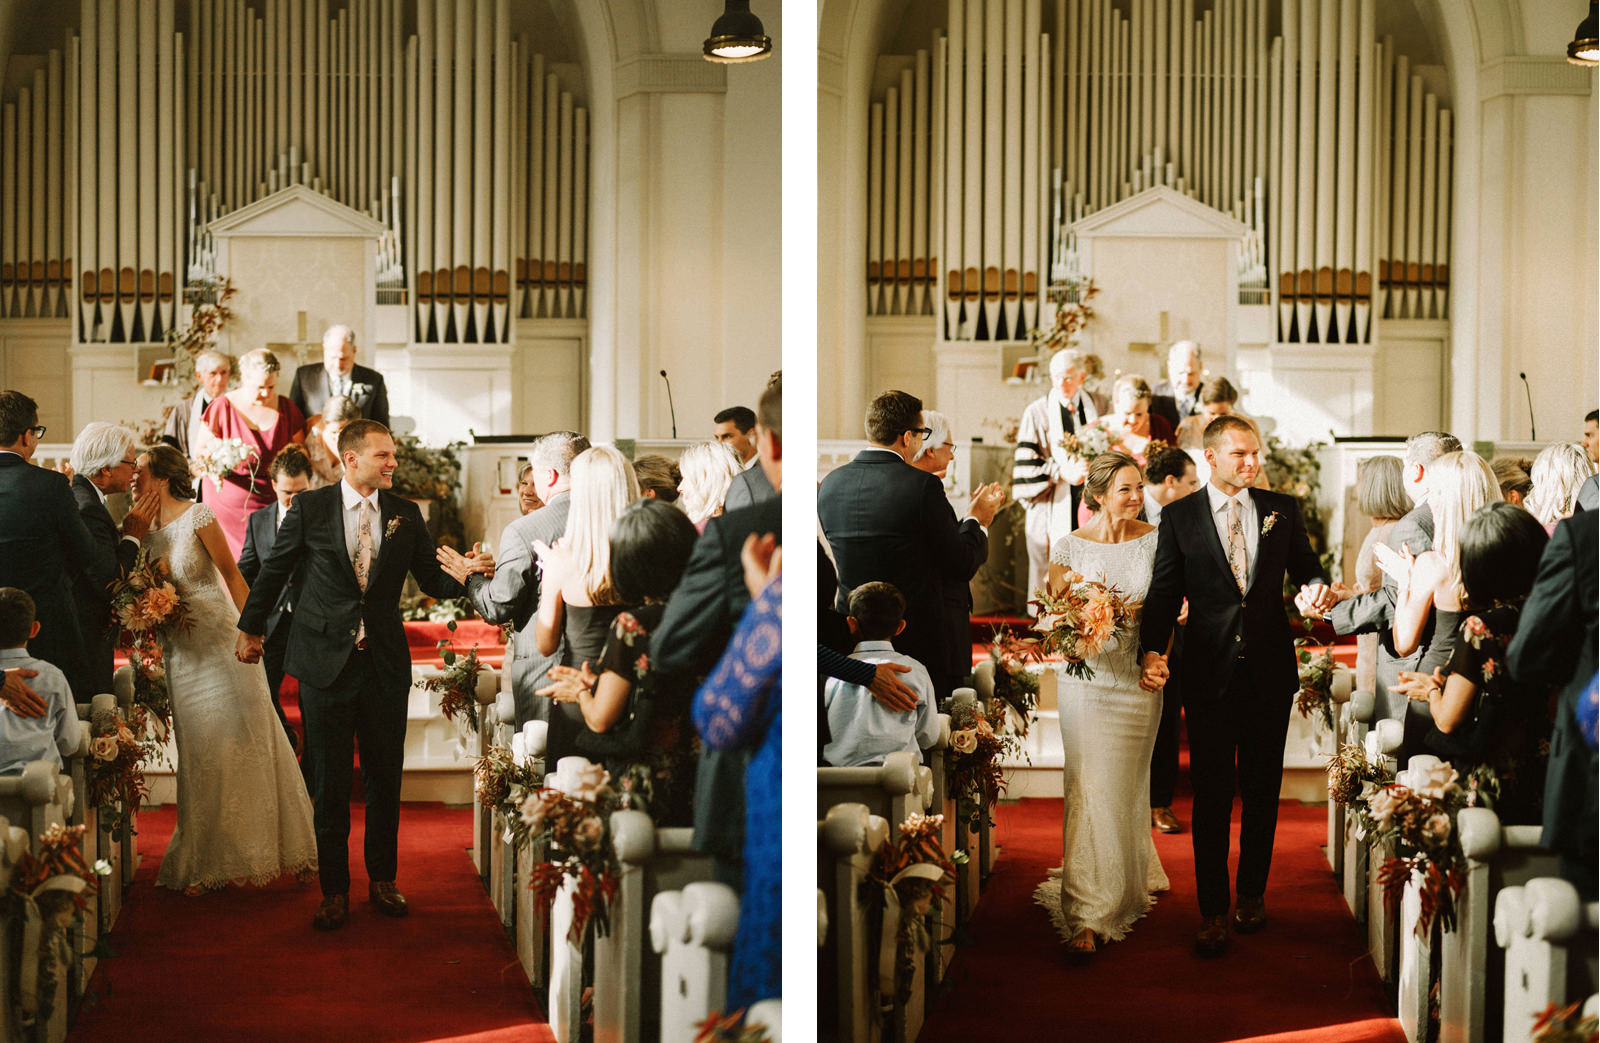 bridgeport-wedding-081 BRIDGEPORT, CONNECTICUT BACKYARD WEDDING